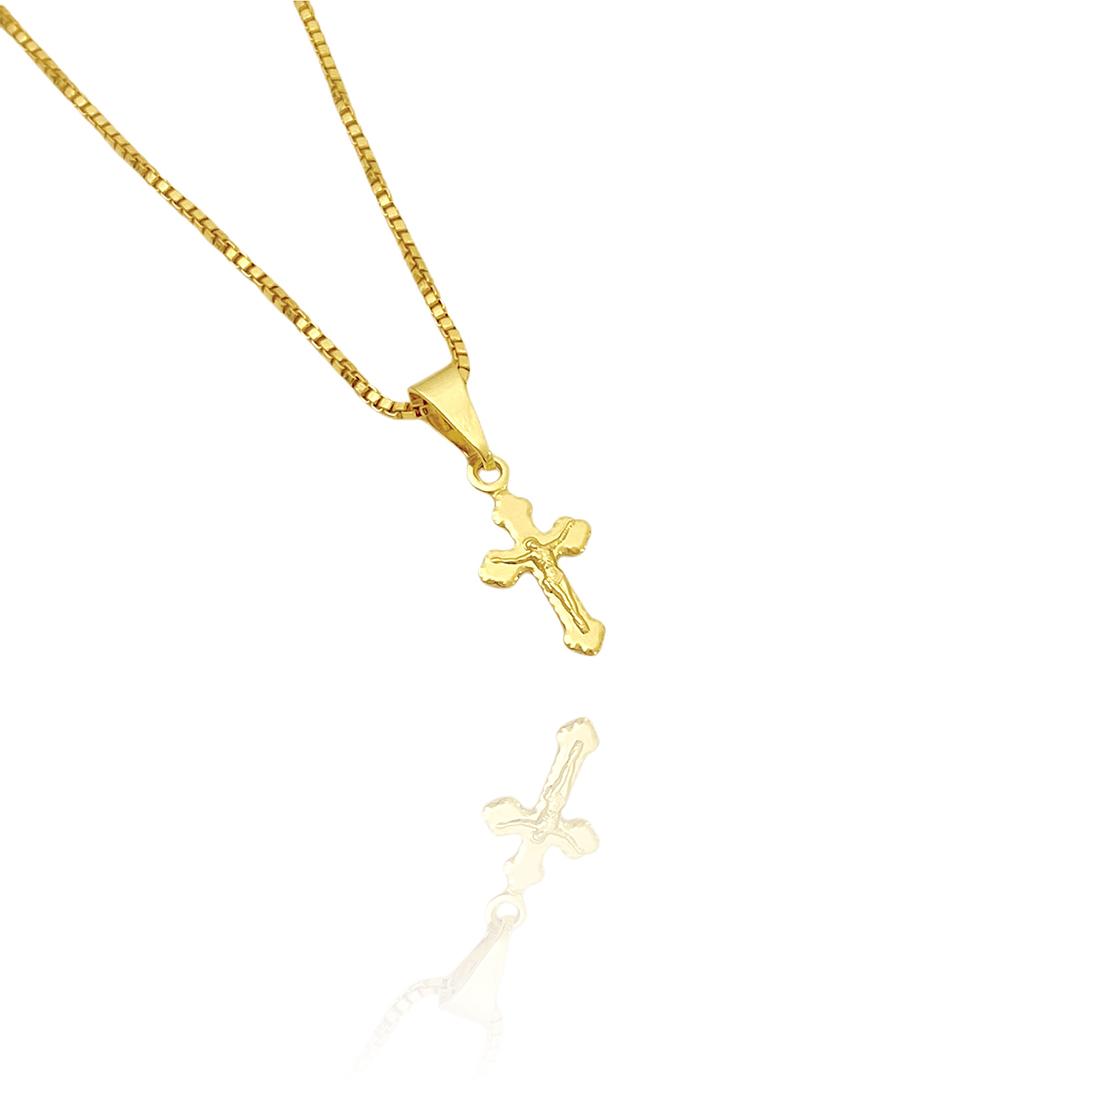 Pingente Crucifixo Jesus Mini (1,7cmX1cm) (Banho Ouro 24k)